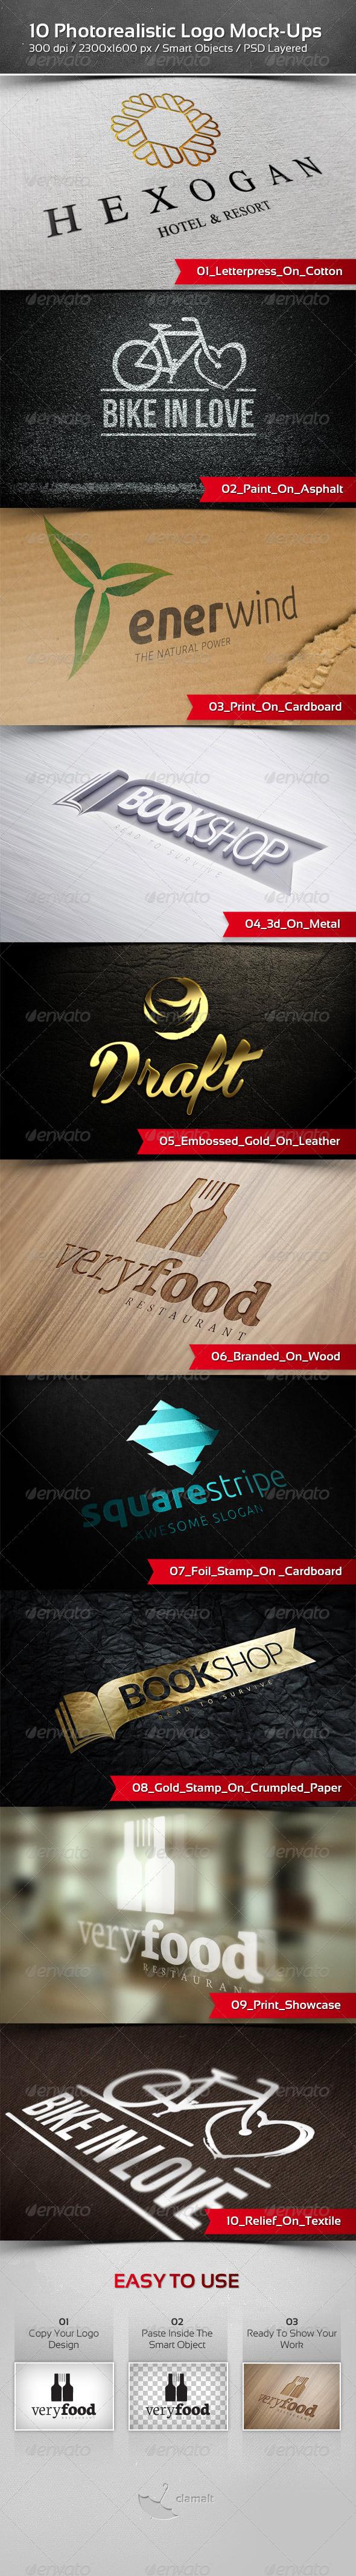 10 Photorealistic Logo Mock-Ups - Product Mock-Ups Graphics